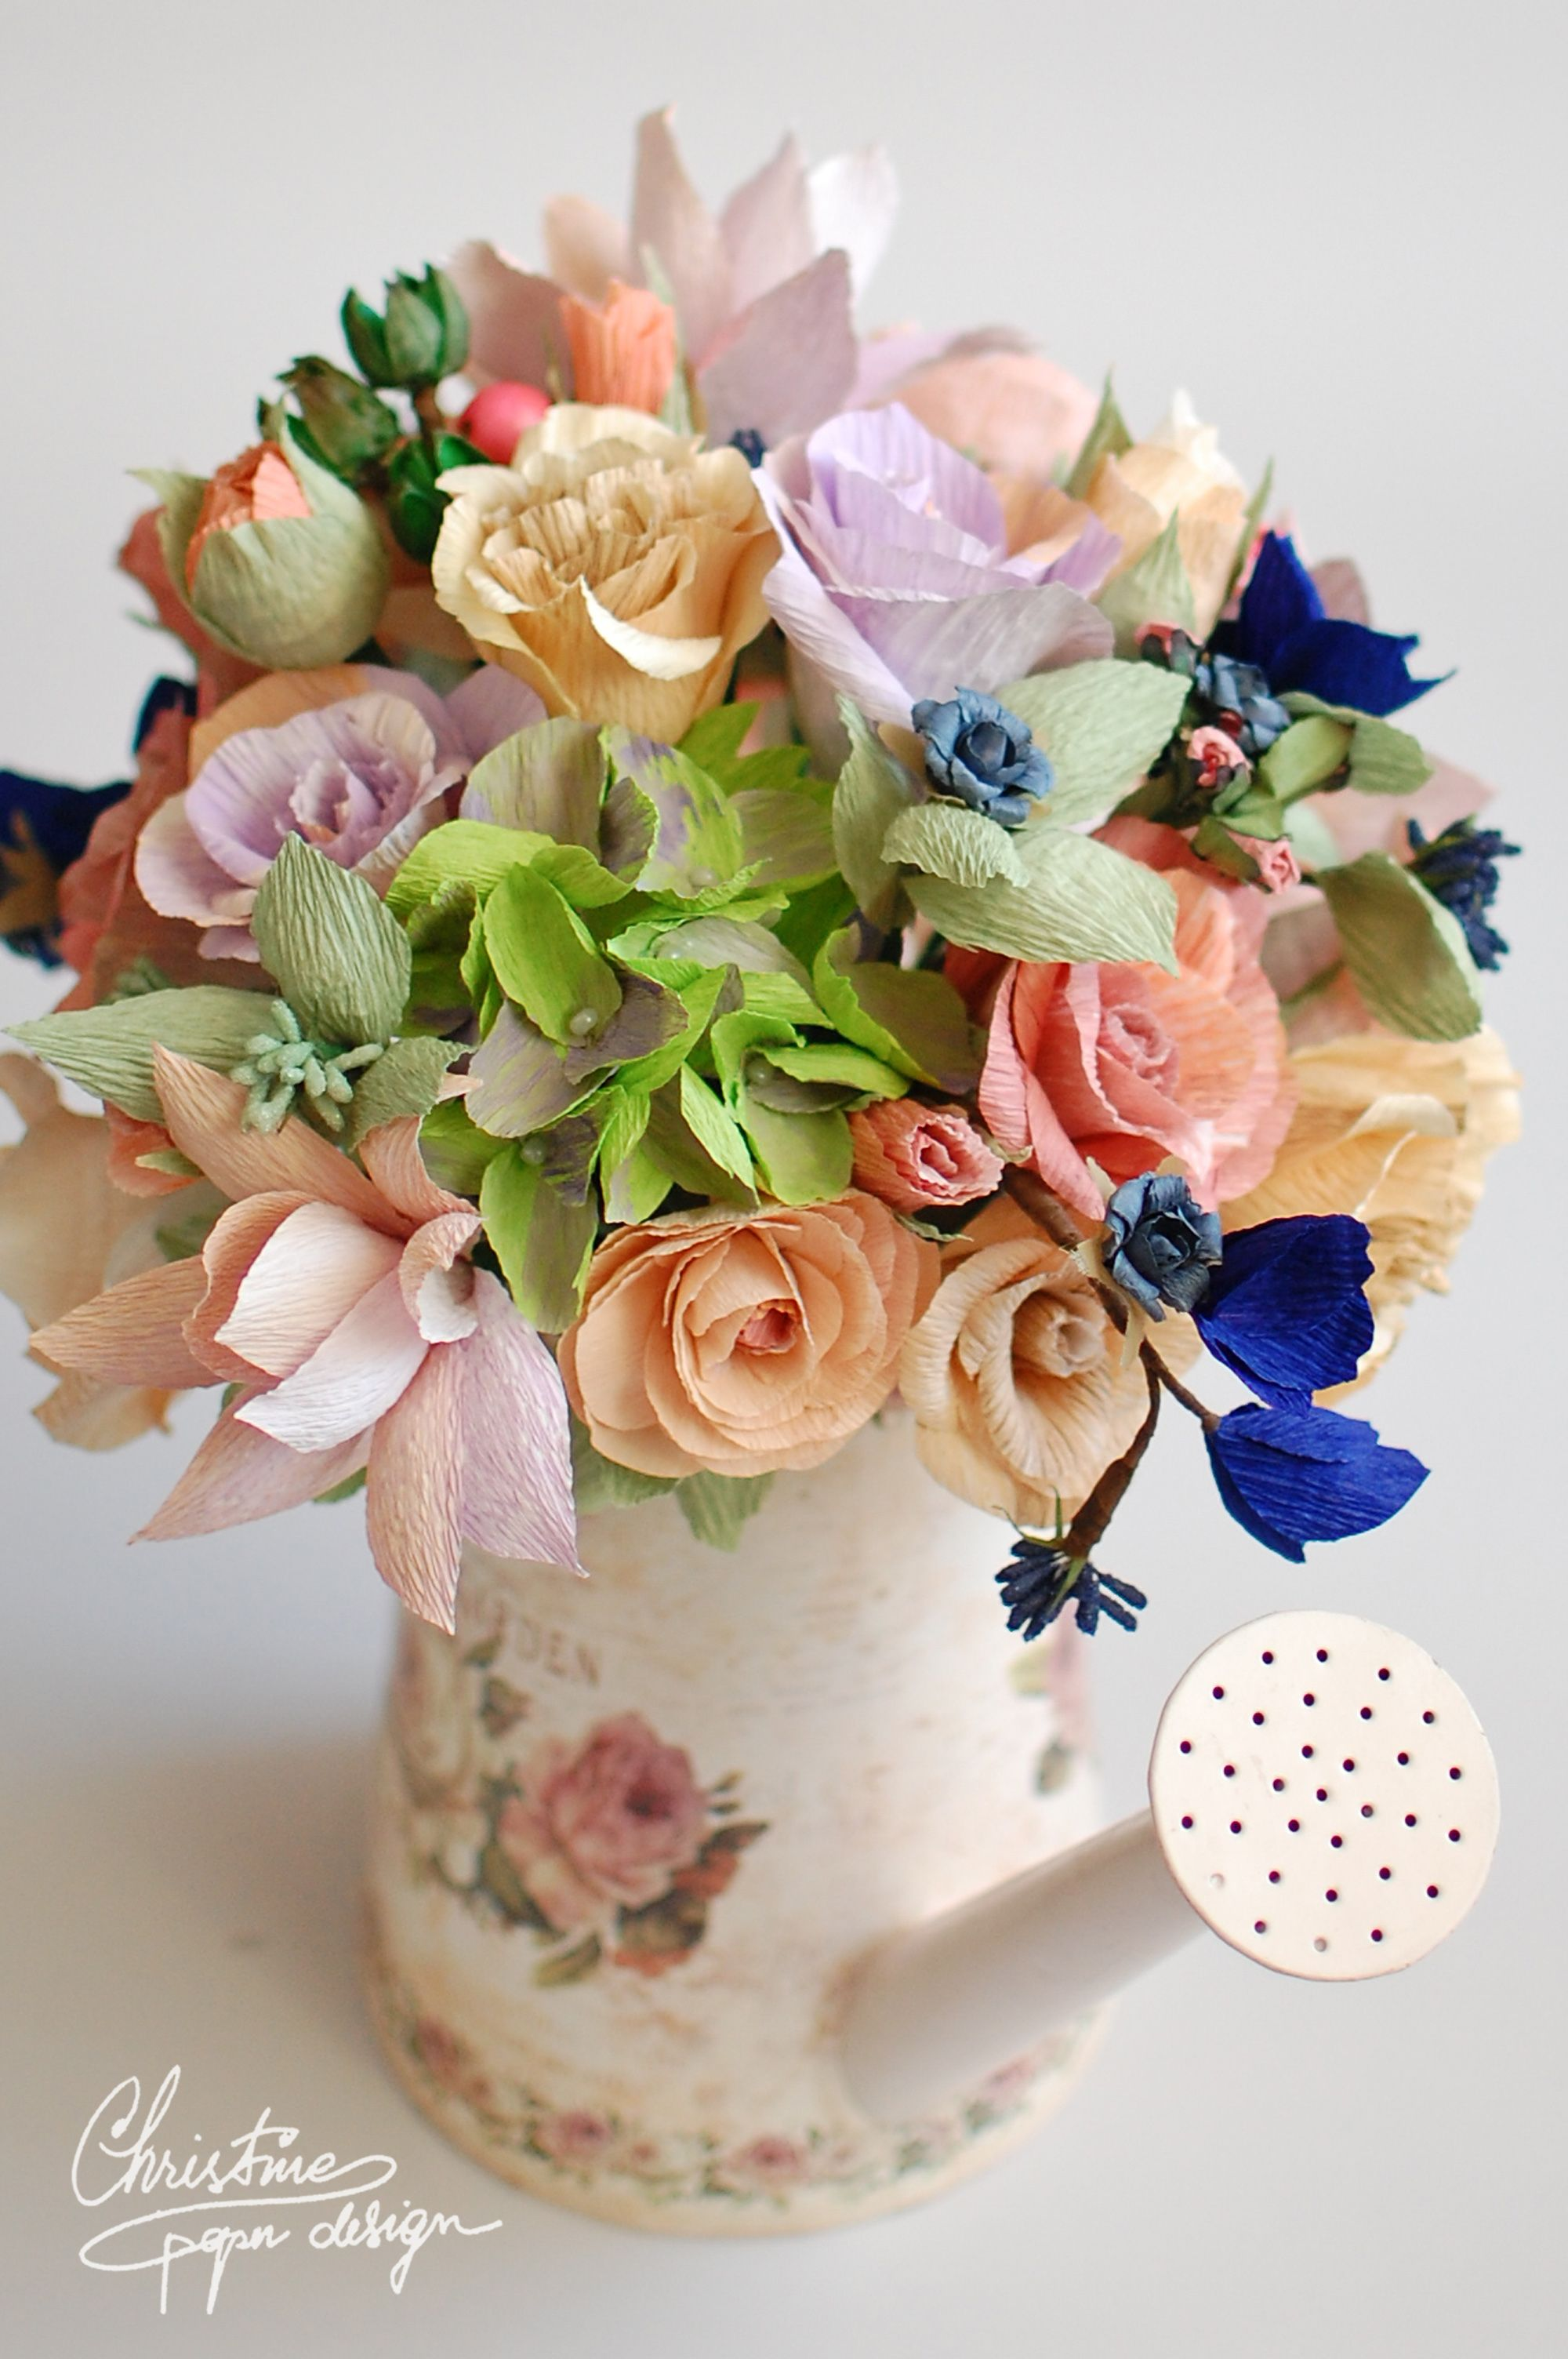 Christine Paper Design Vintage Paper Flowers Centerpiece